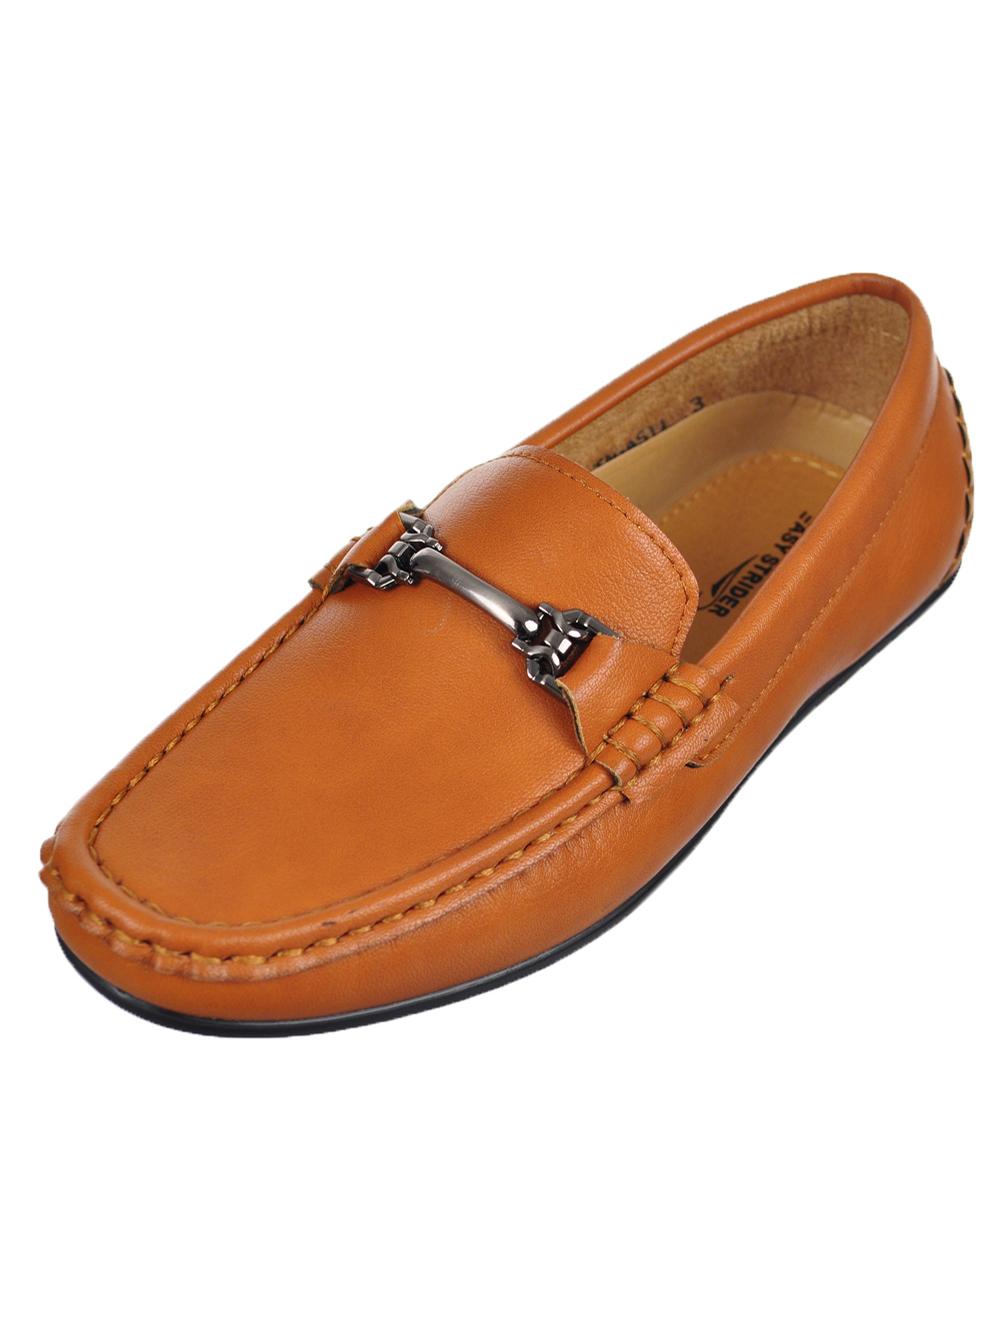 Steve Harvey Boys Driving Loafers